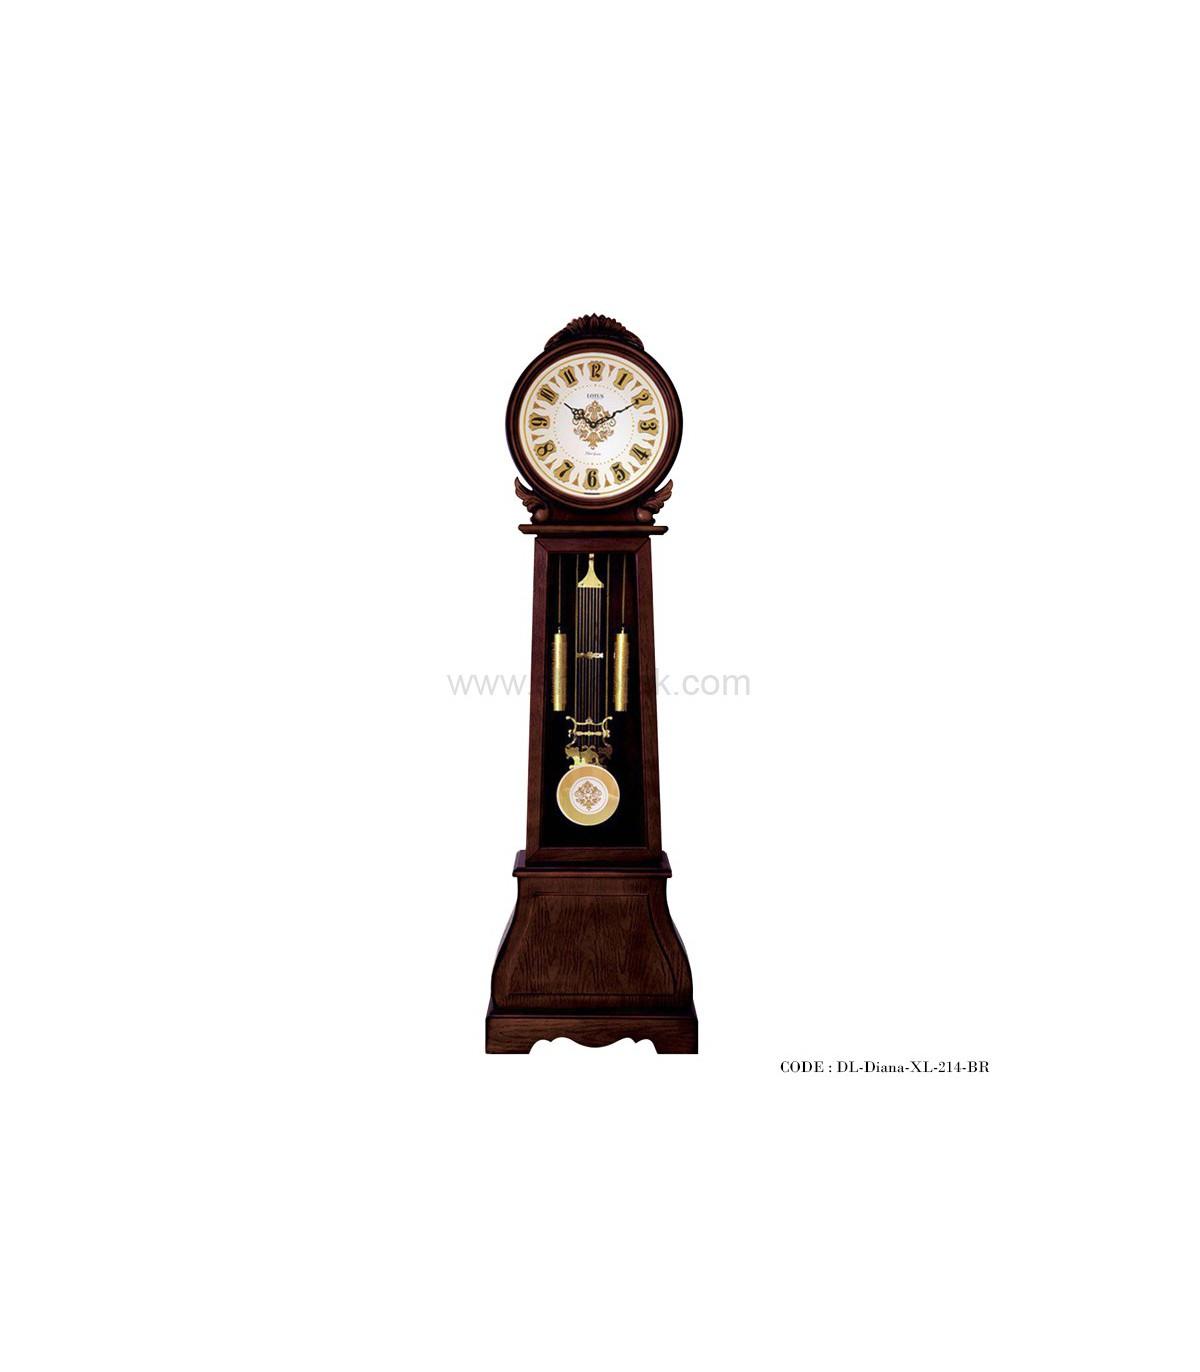 مدل ساعت ایستاده طرح دیانا سونایی